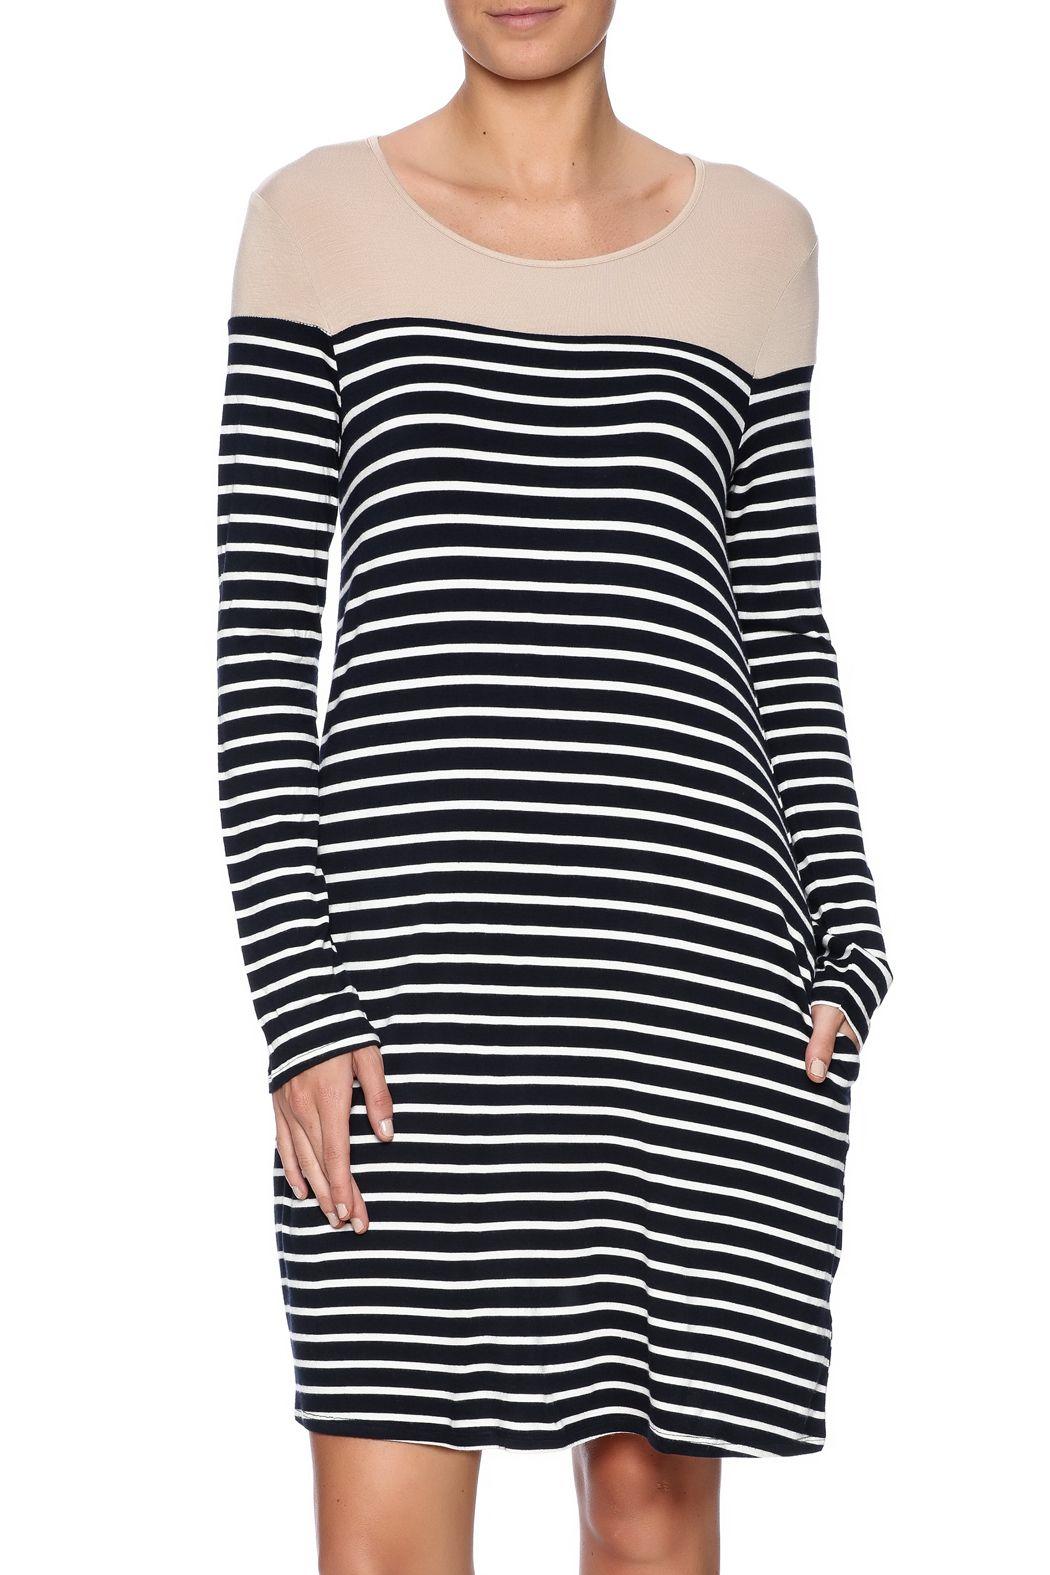 Stripe dress pinterest